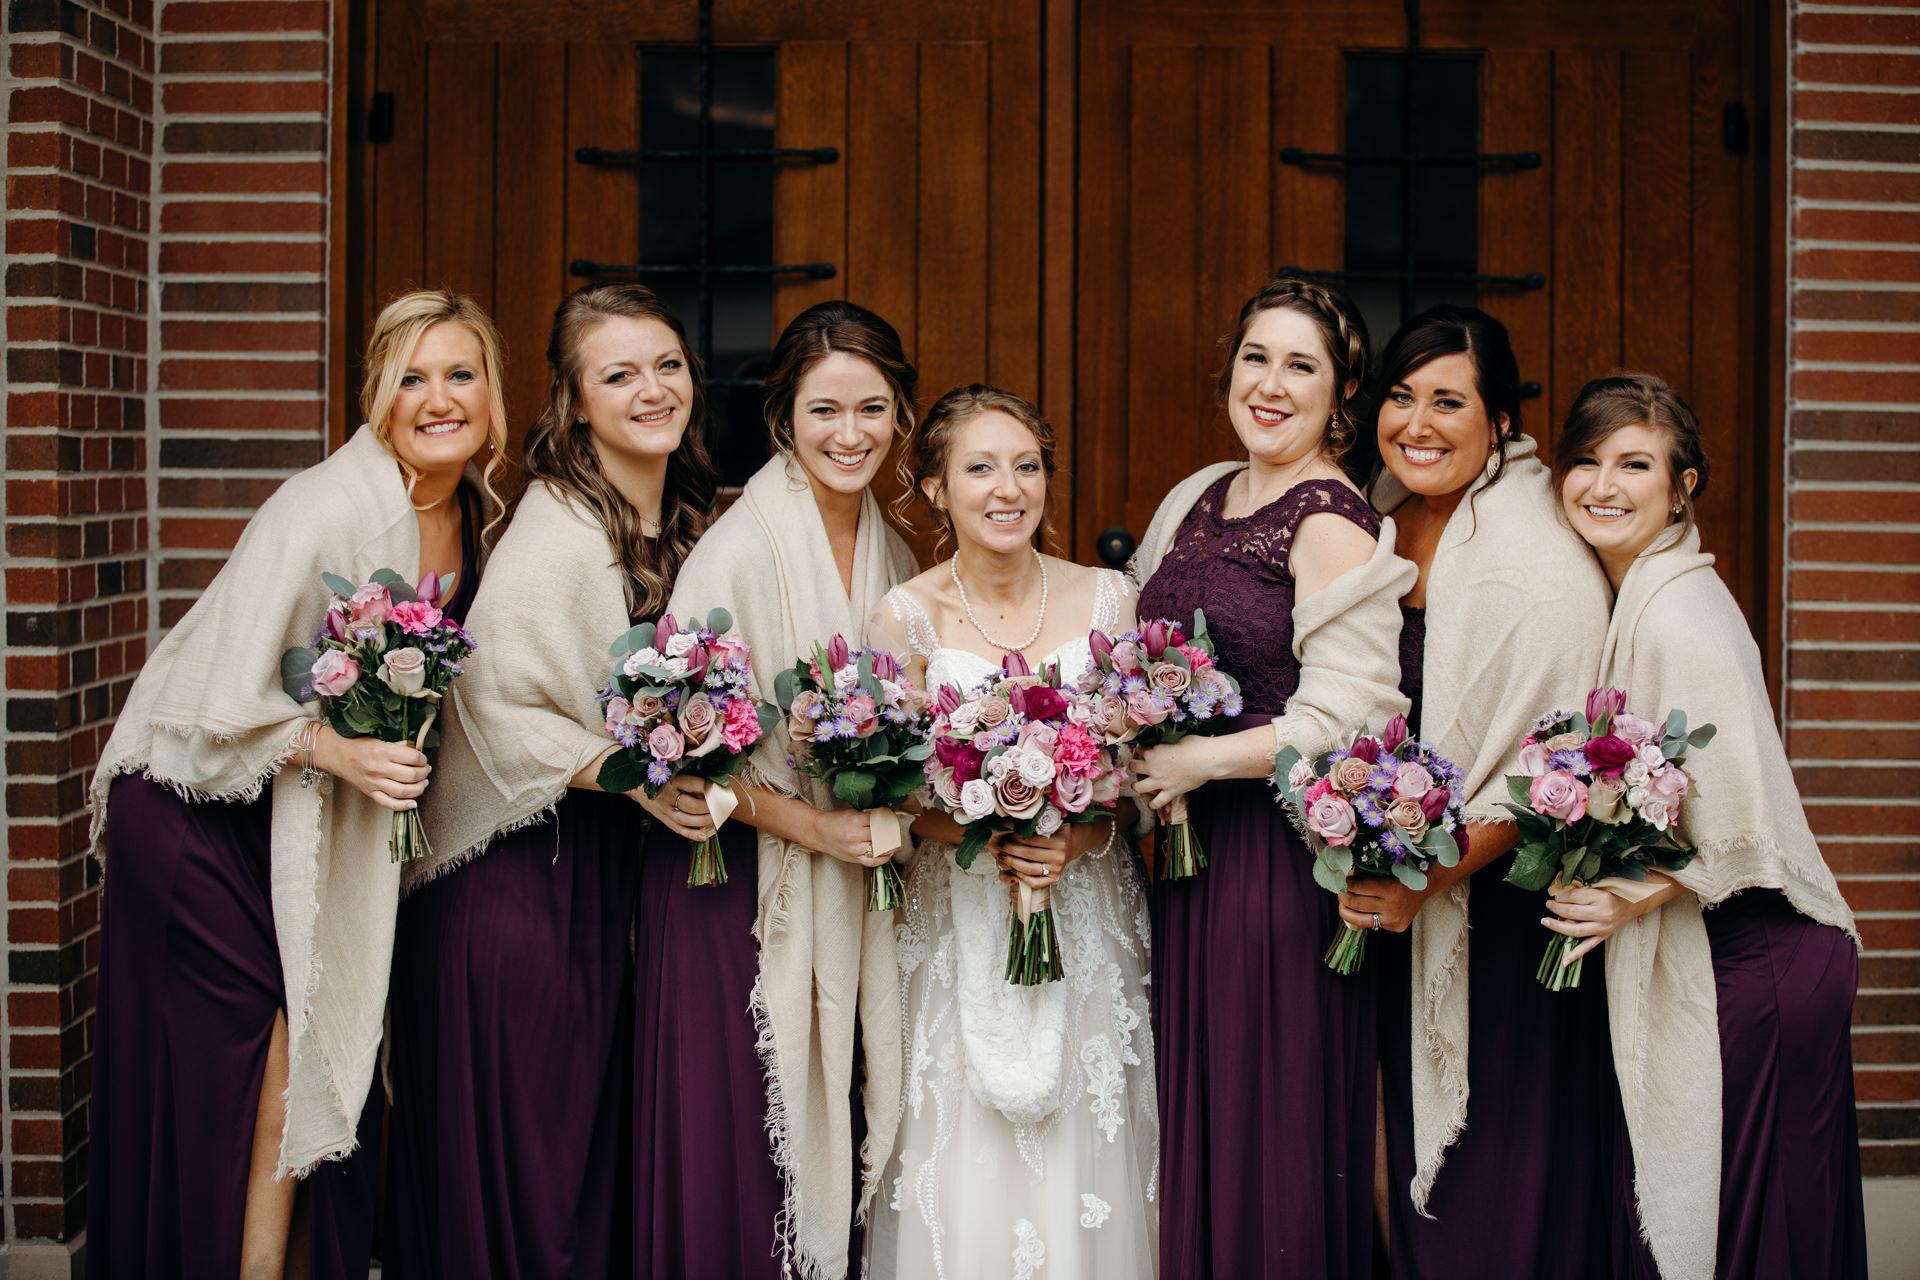 Armory wedding south bend grant beachy photography elkhart goshen -030.jpg